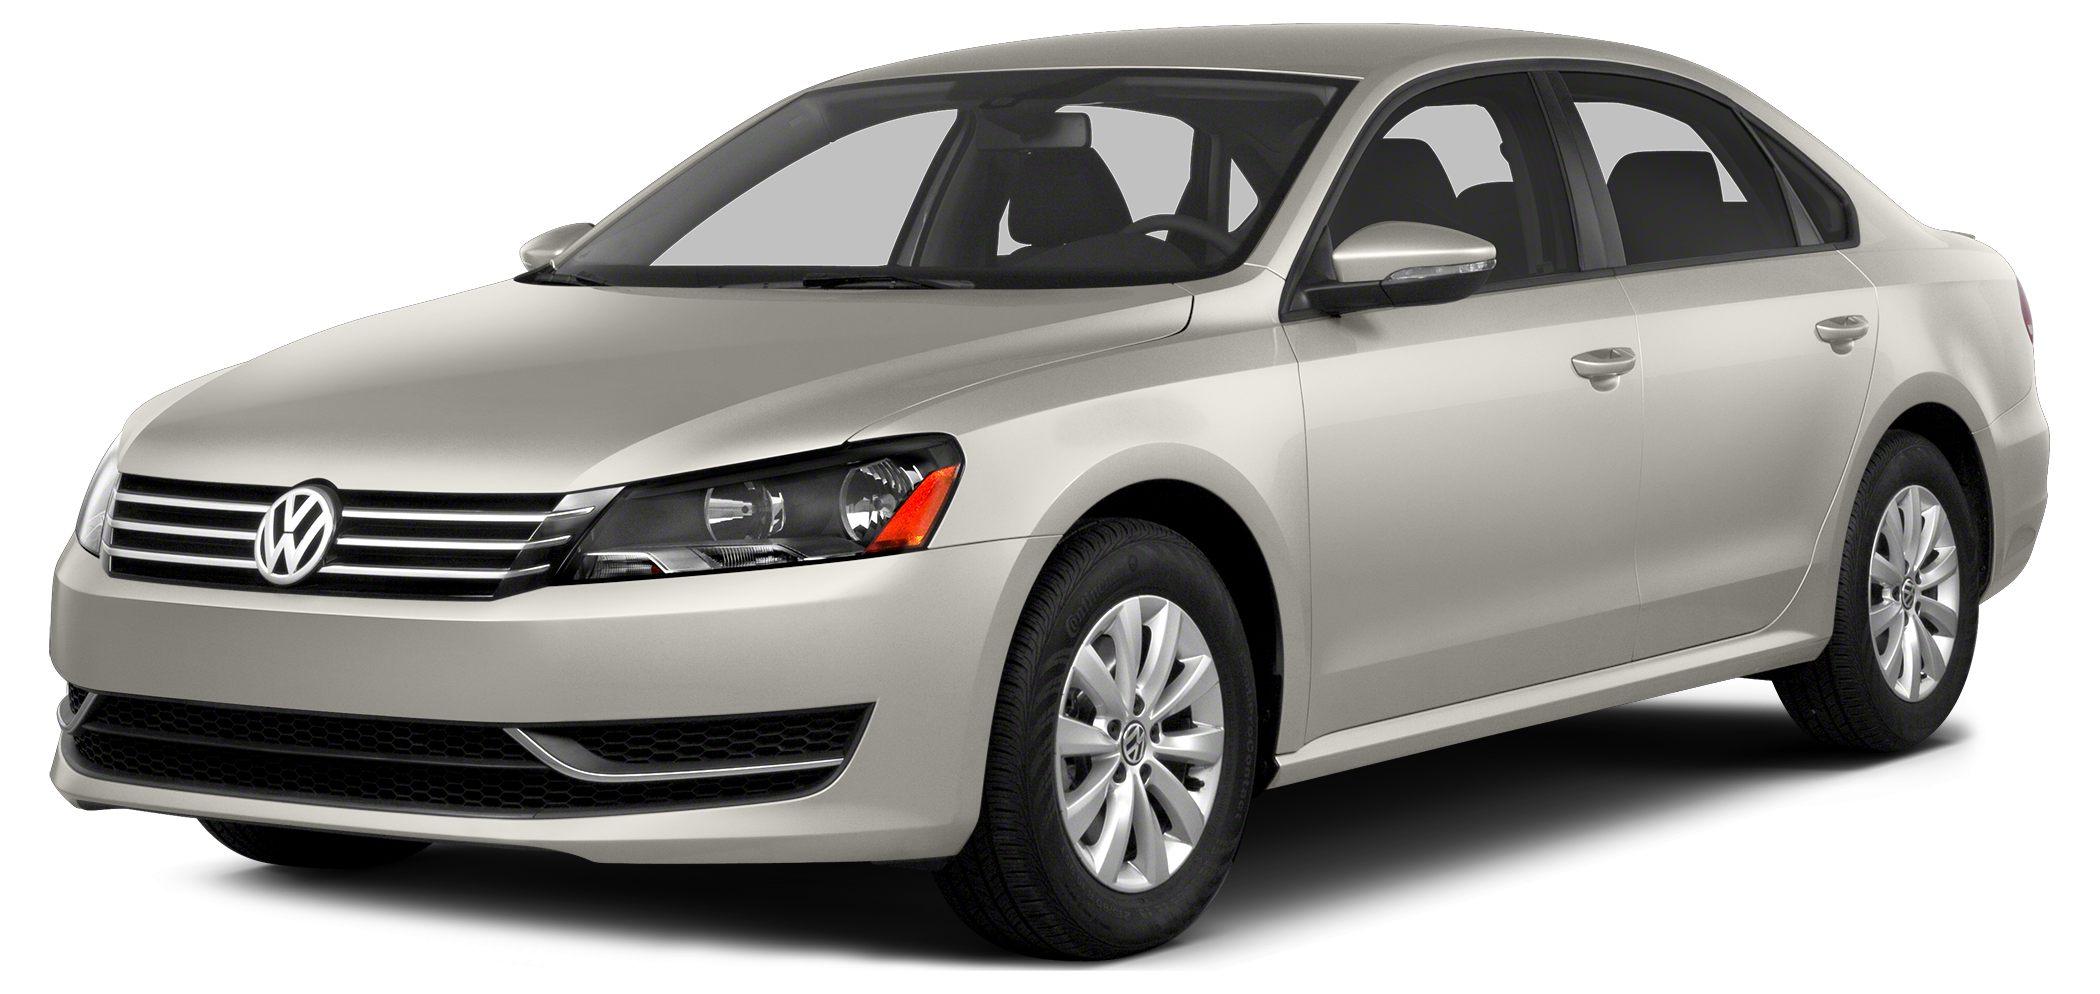 2015 Volkswagen Passat 18T Limited Edition The Volkswagen Passat has balanced proportions and an